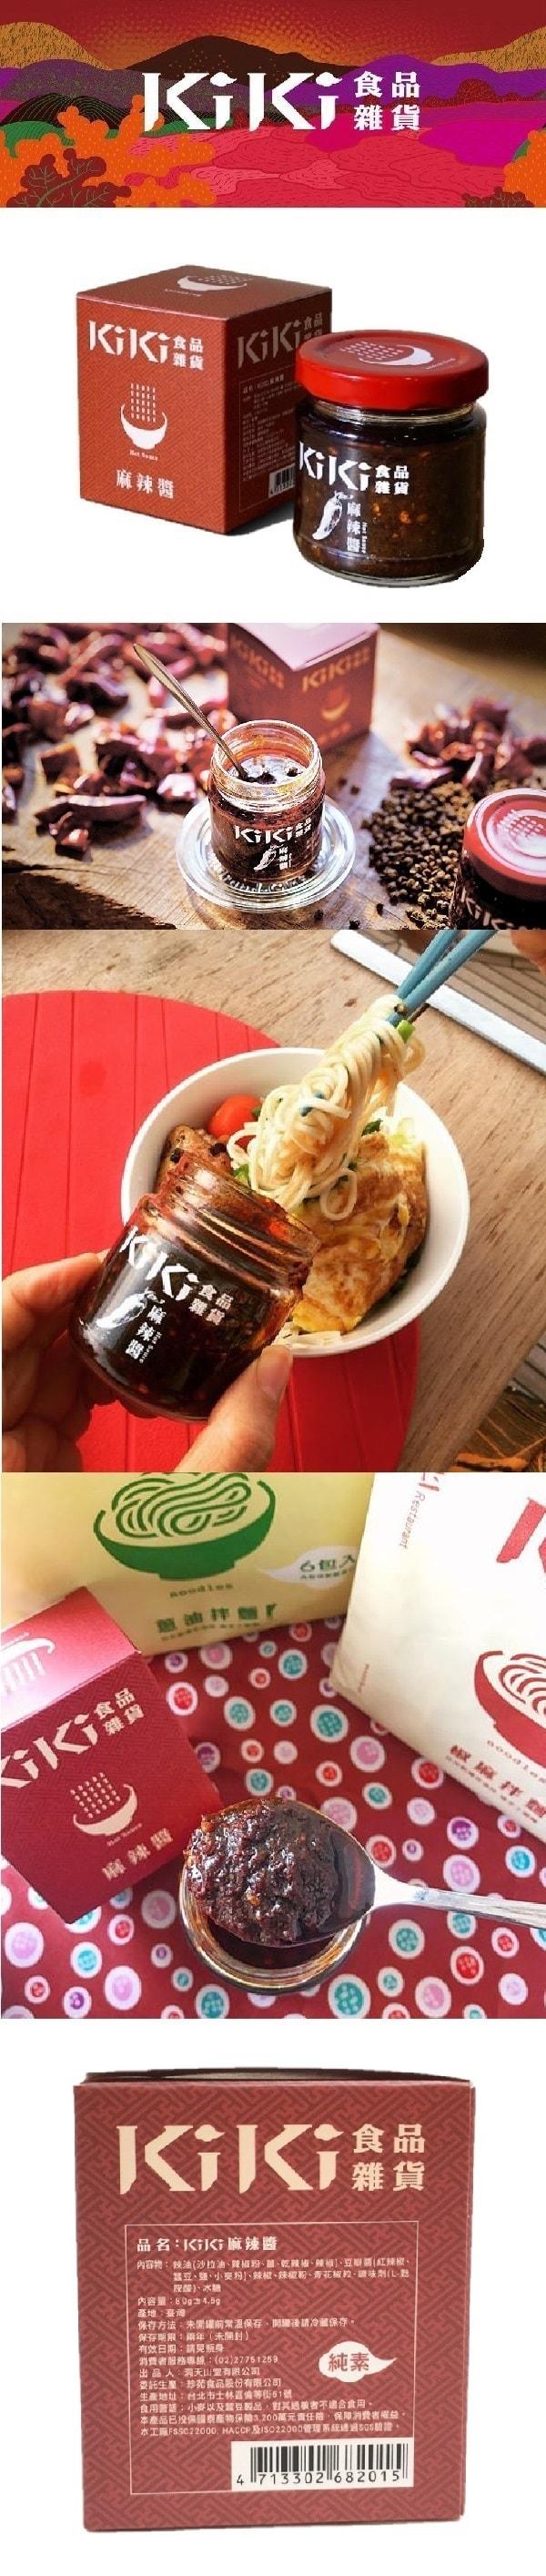 [台湾直邮] KIKI食品杂货 麻辣酱 80g